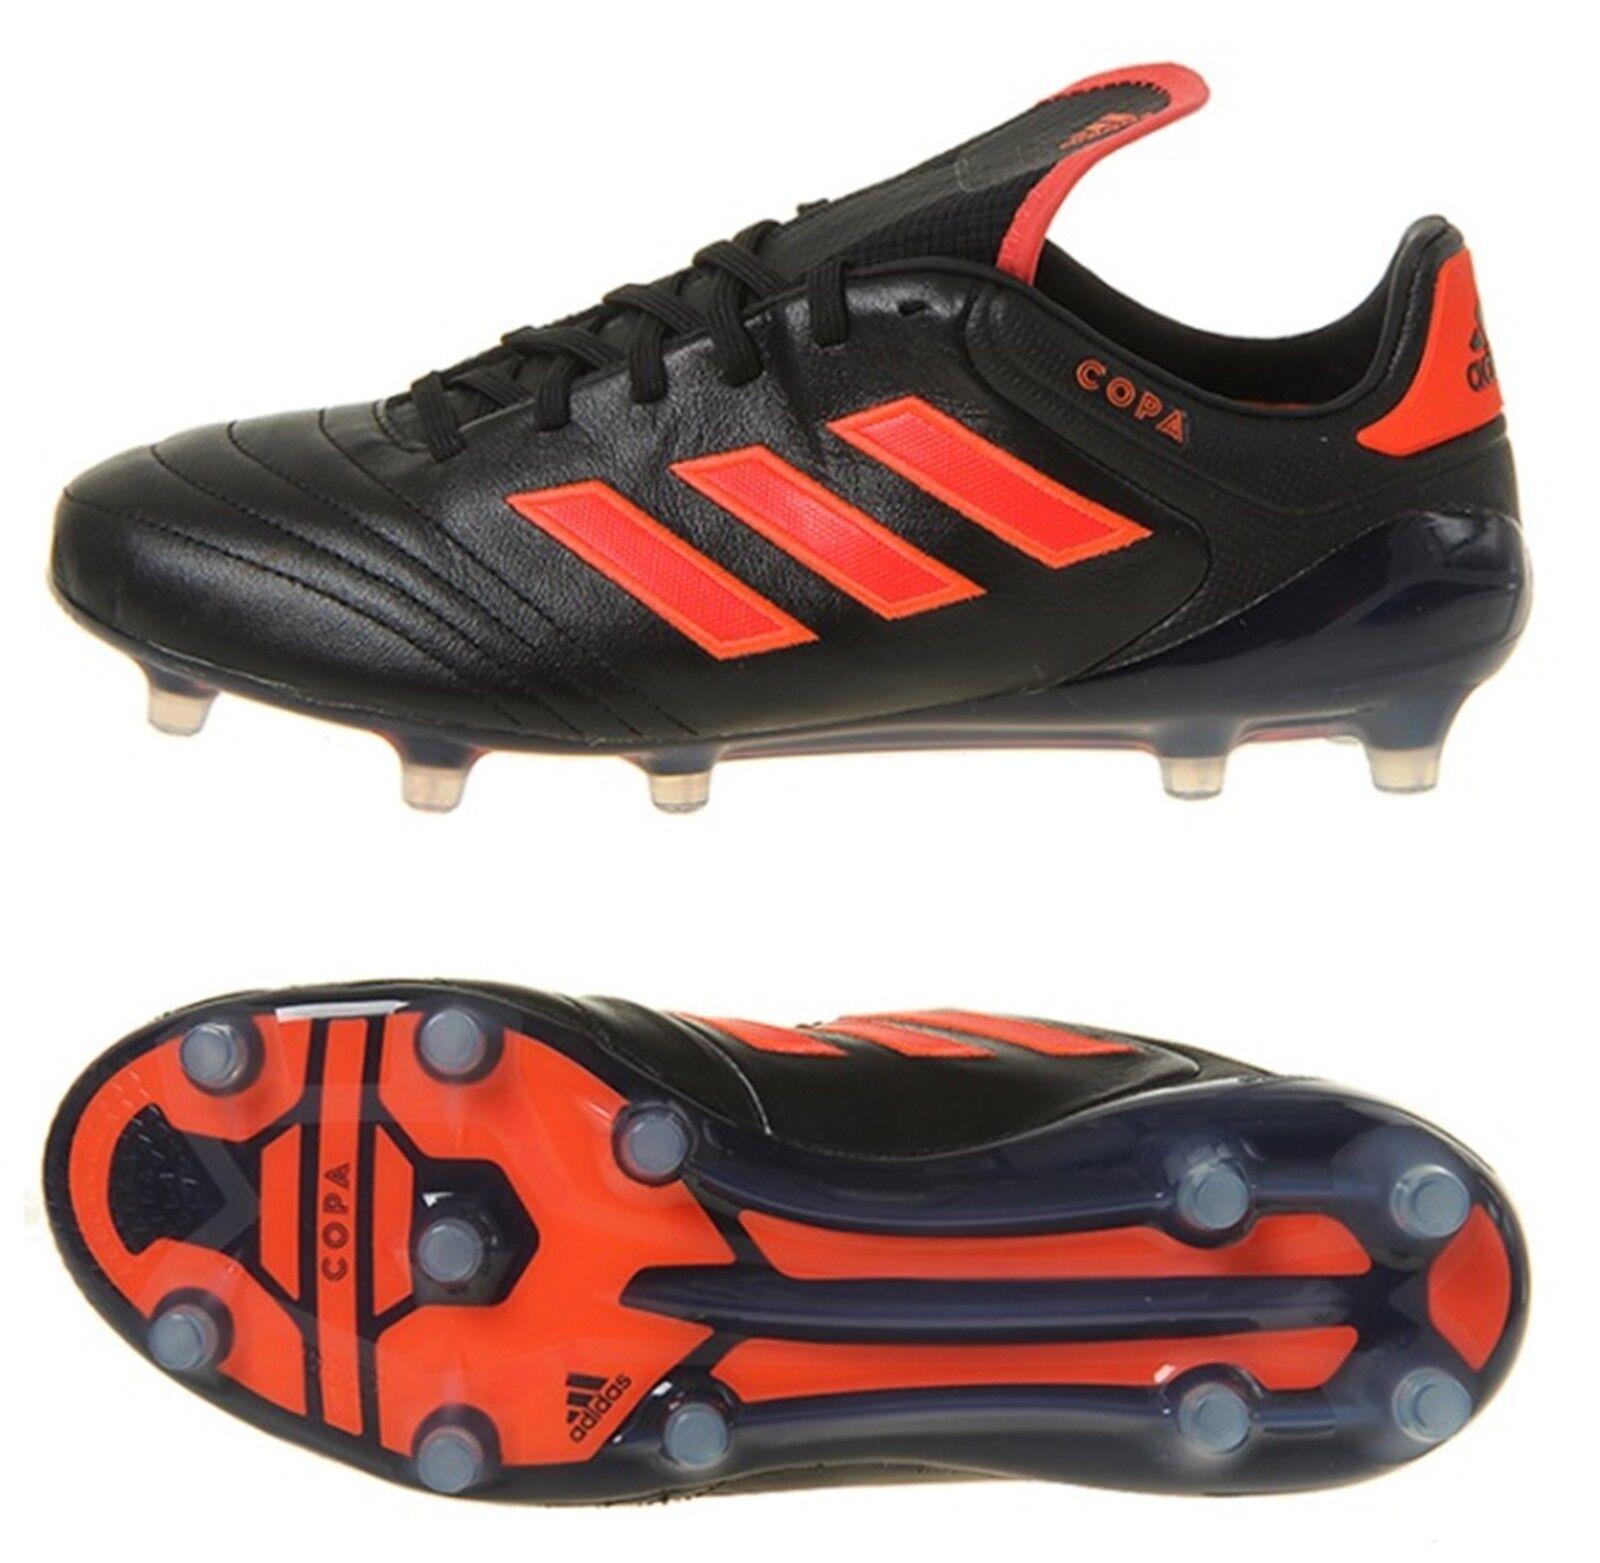 Botines Adidas Hombres Copa 17.1 FG Negro Balonpié Fútbol Gimnasio Zapatos Spike S77128